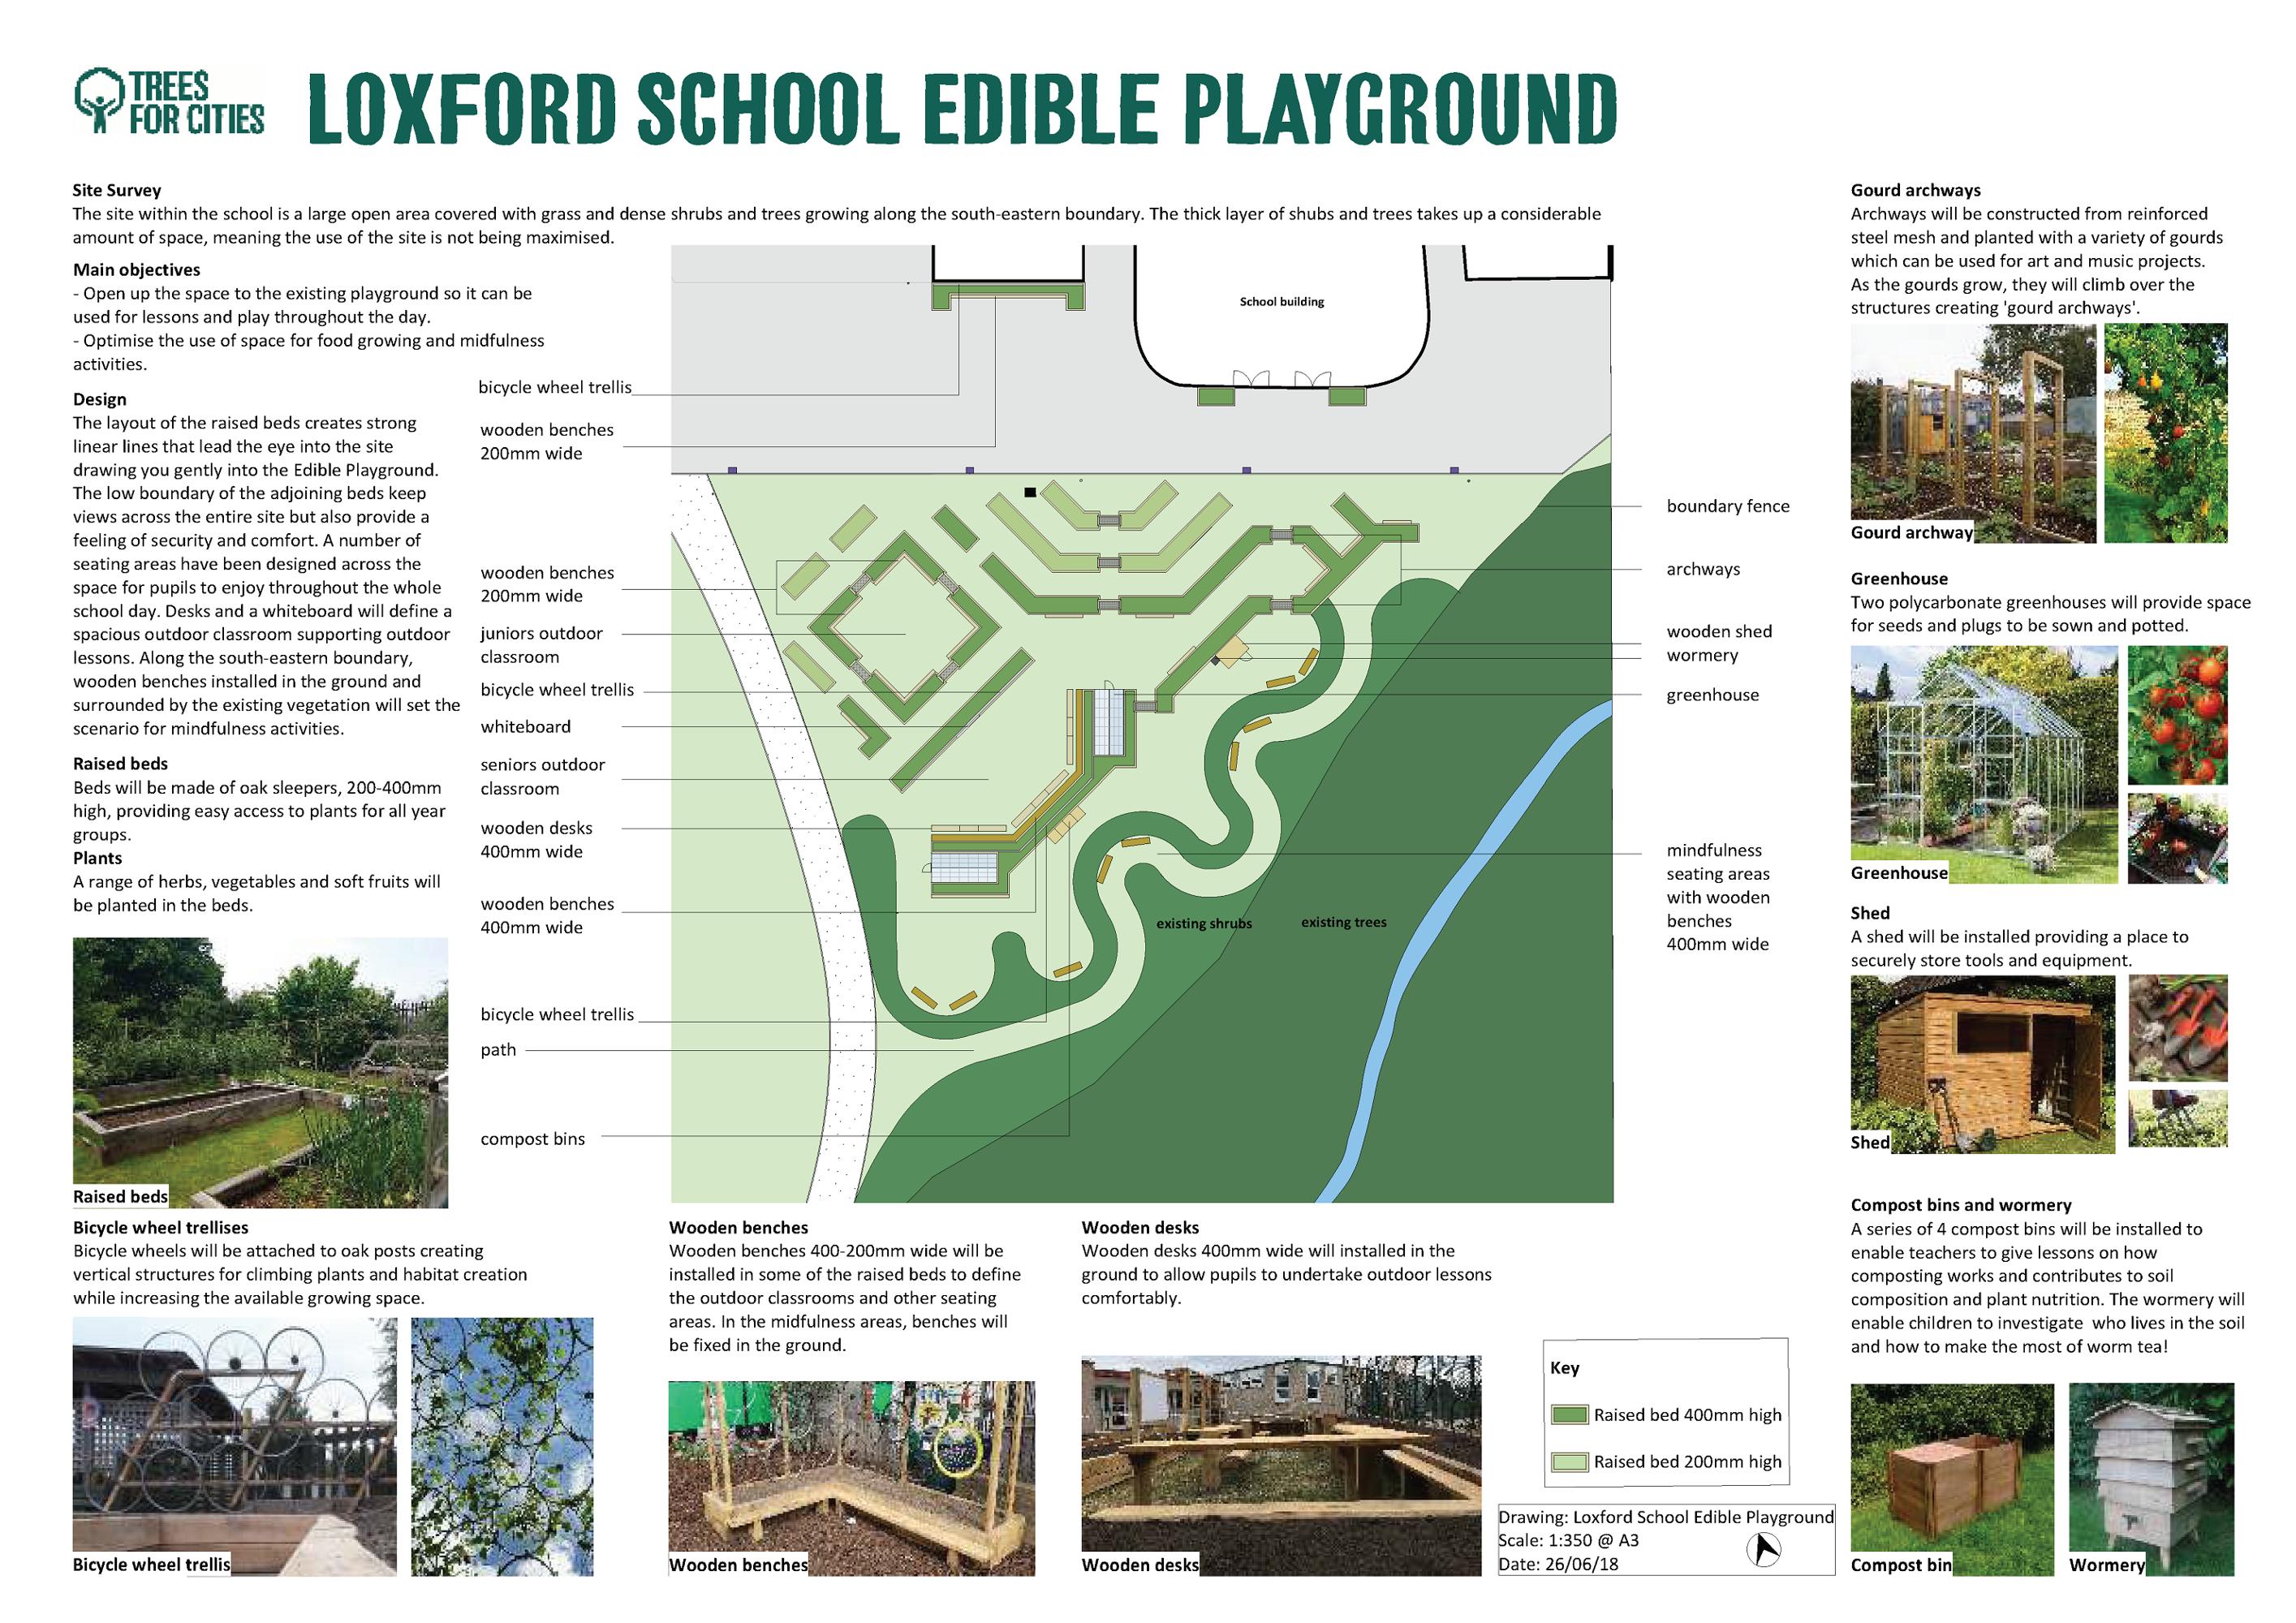 Loxford School Edible Playground Final Design compressed 3